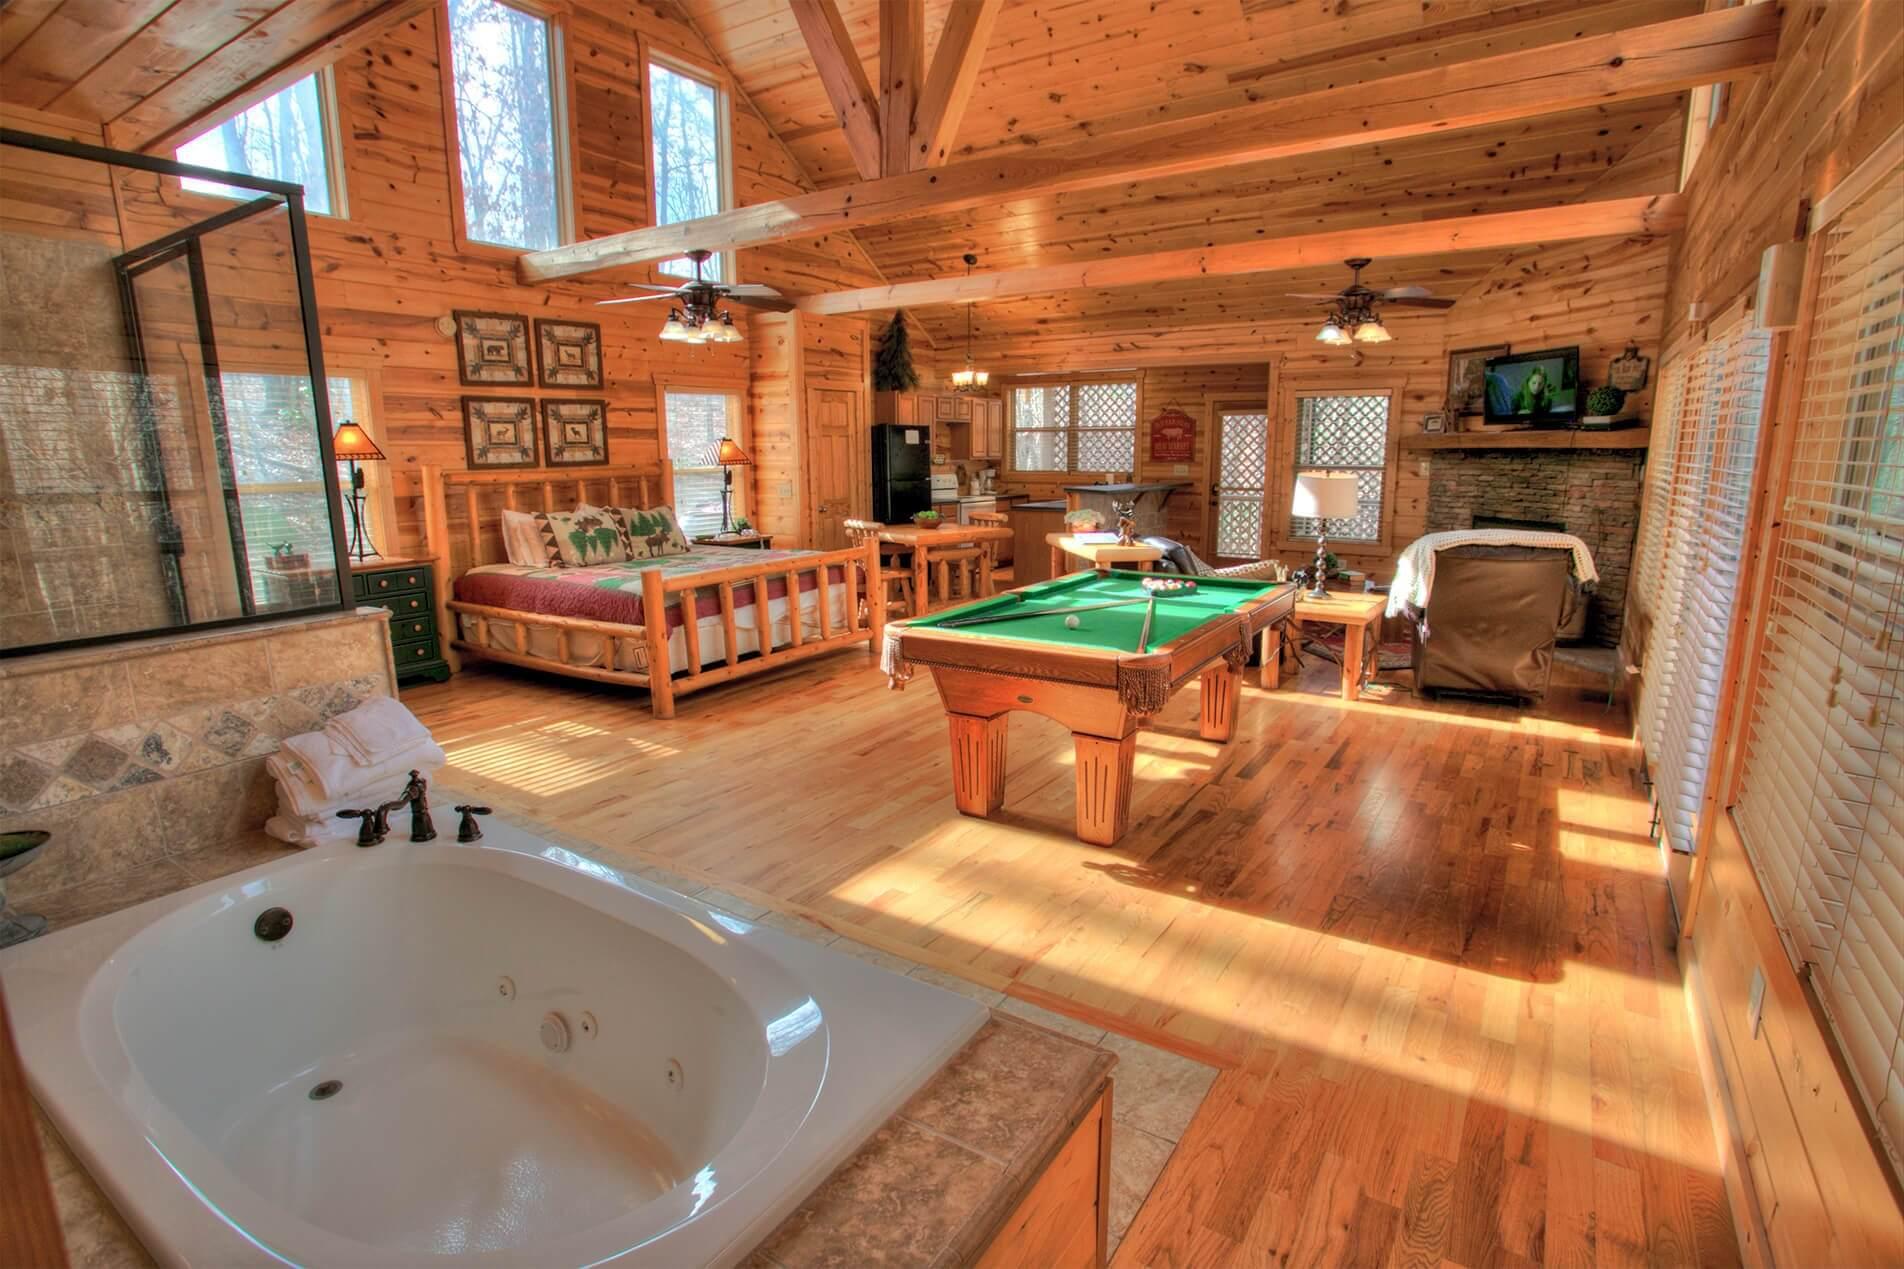 Escape-Cedar-Creek-Cabin-Rentals-Helen-Georgia-top-banner-tiny